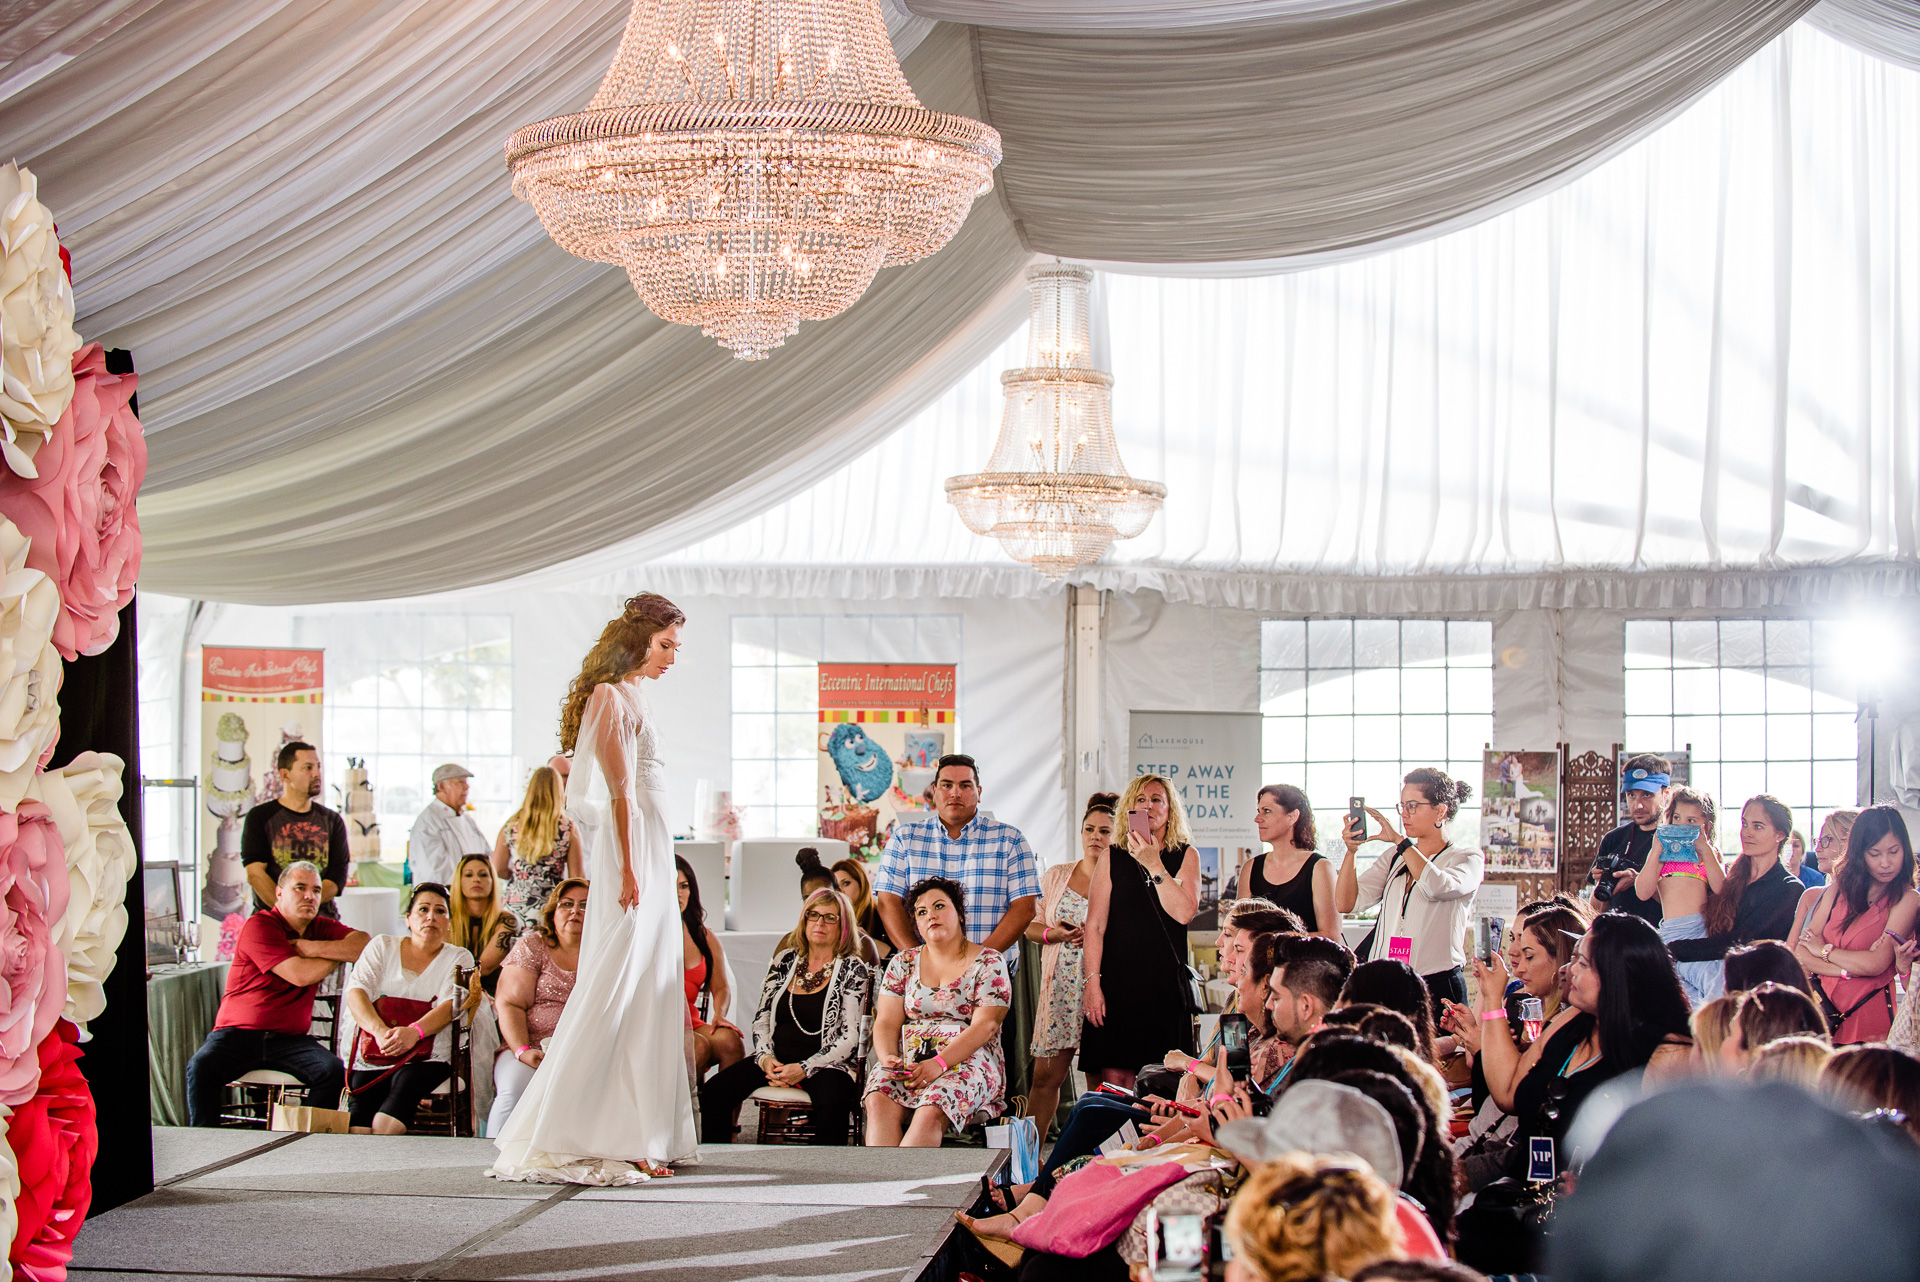 Wedding Party Expo - Hyatt Regency - Paul Douda Photography - 531.jpg